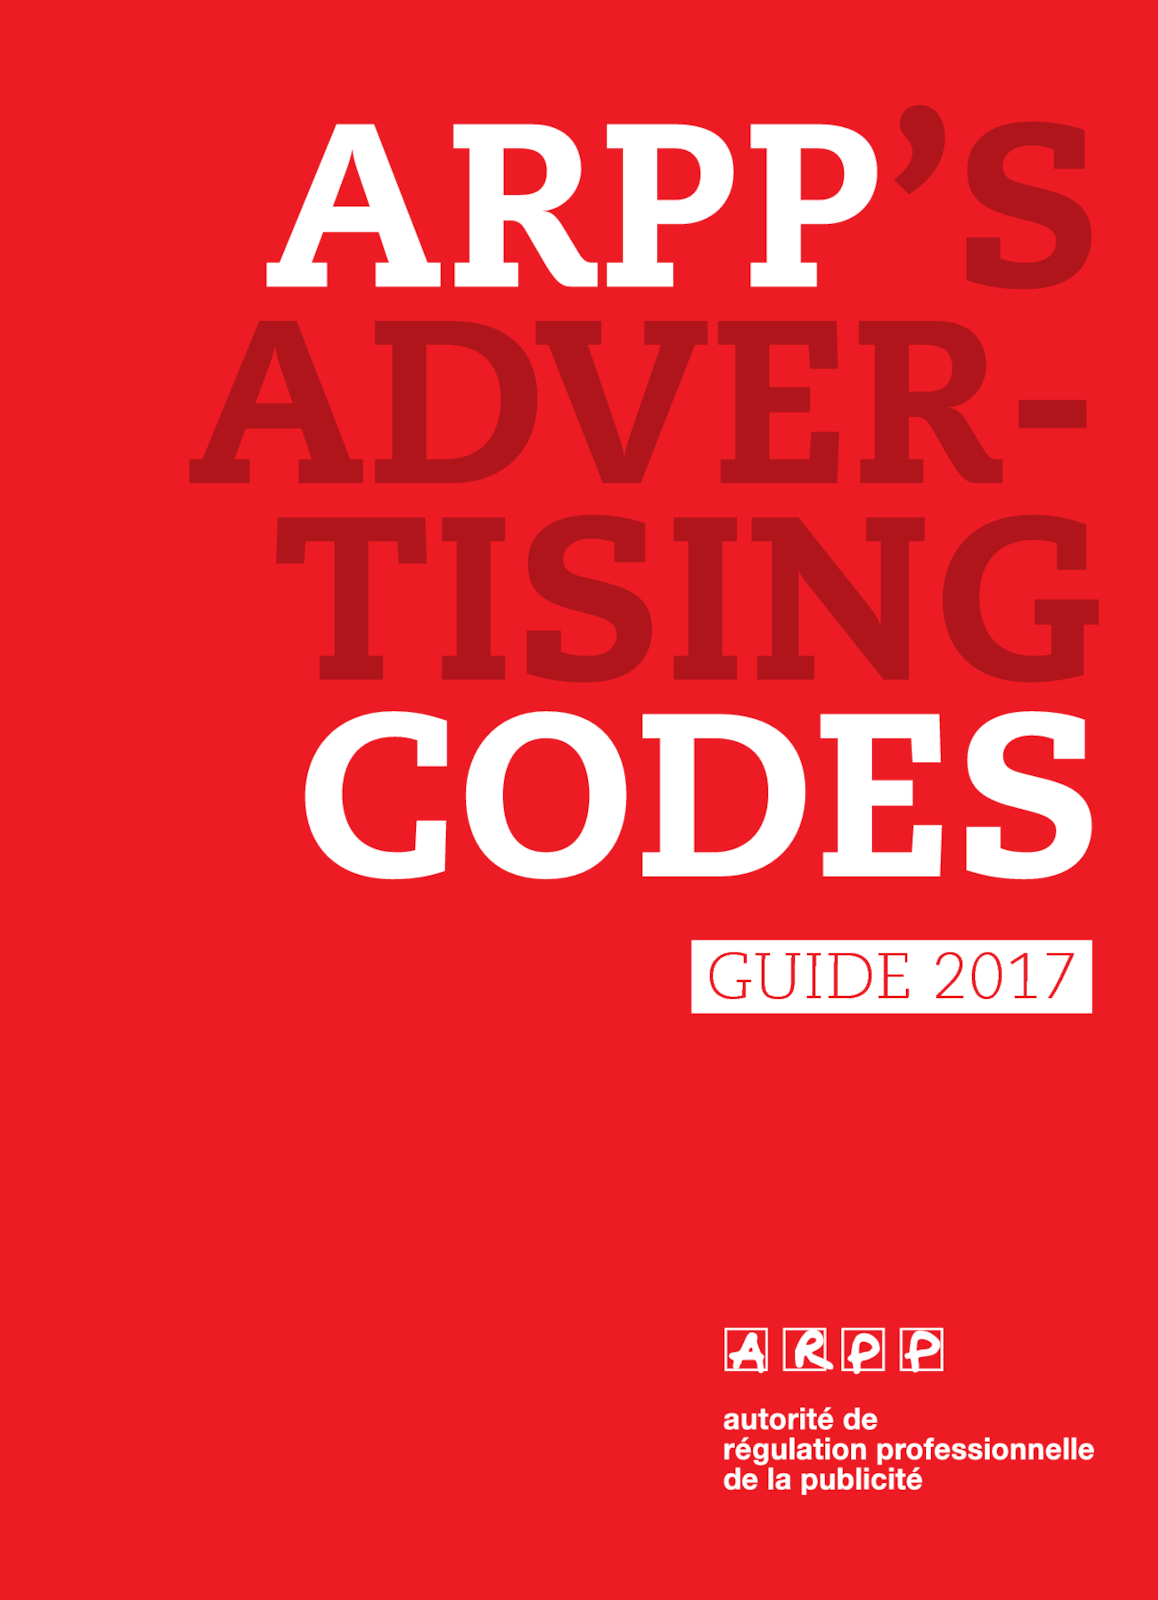 ARPP's advetising codes